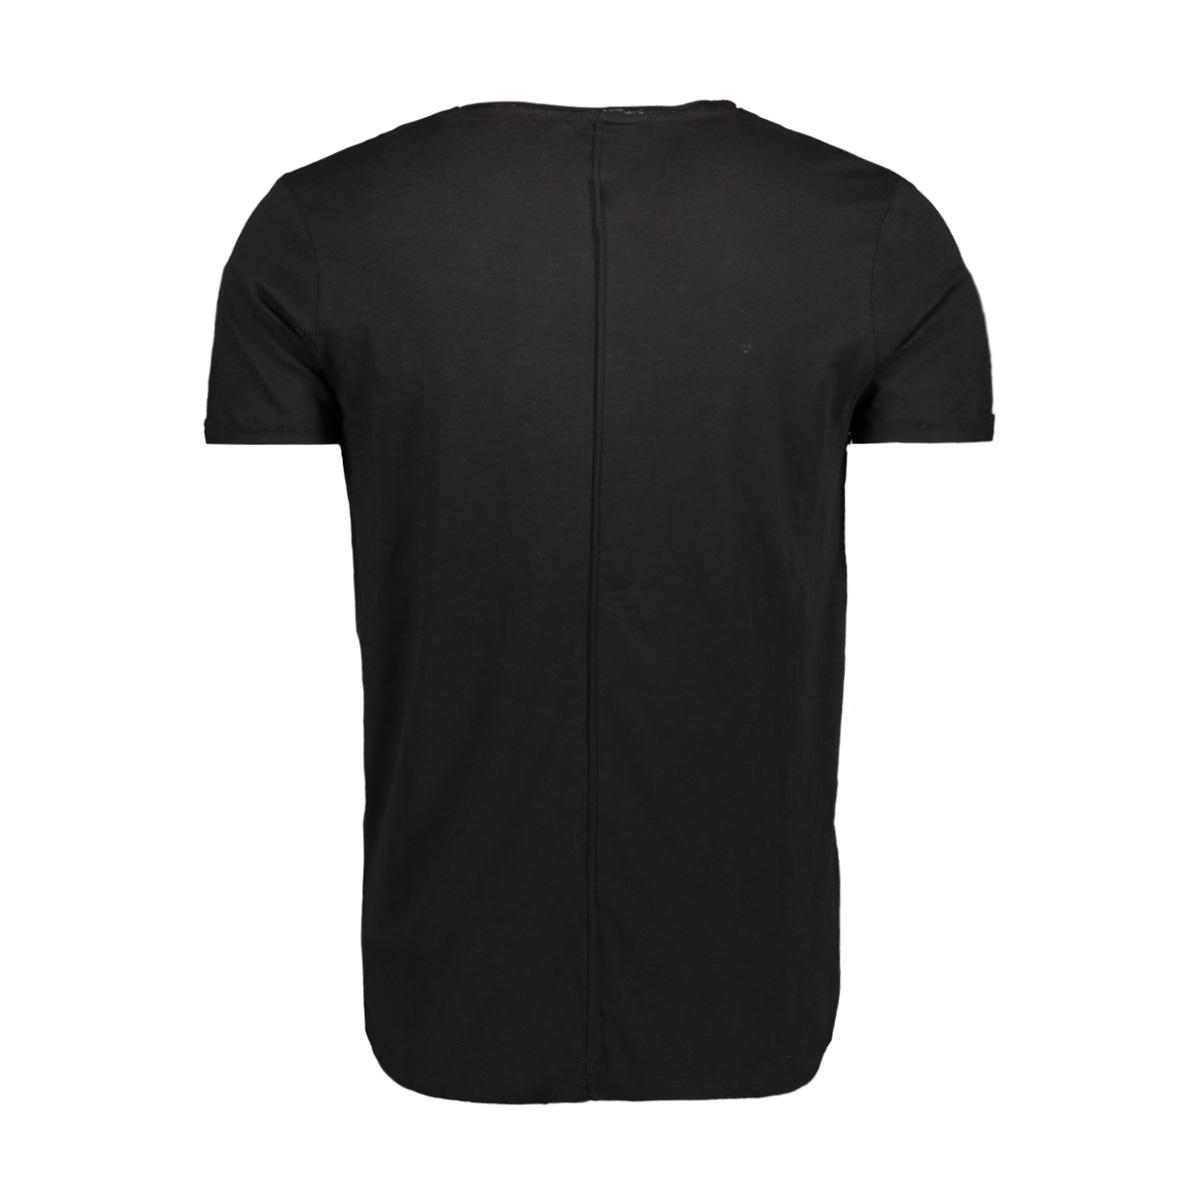 1055303.09.12 tom tailor t-shirt 2999